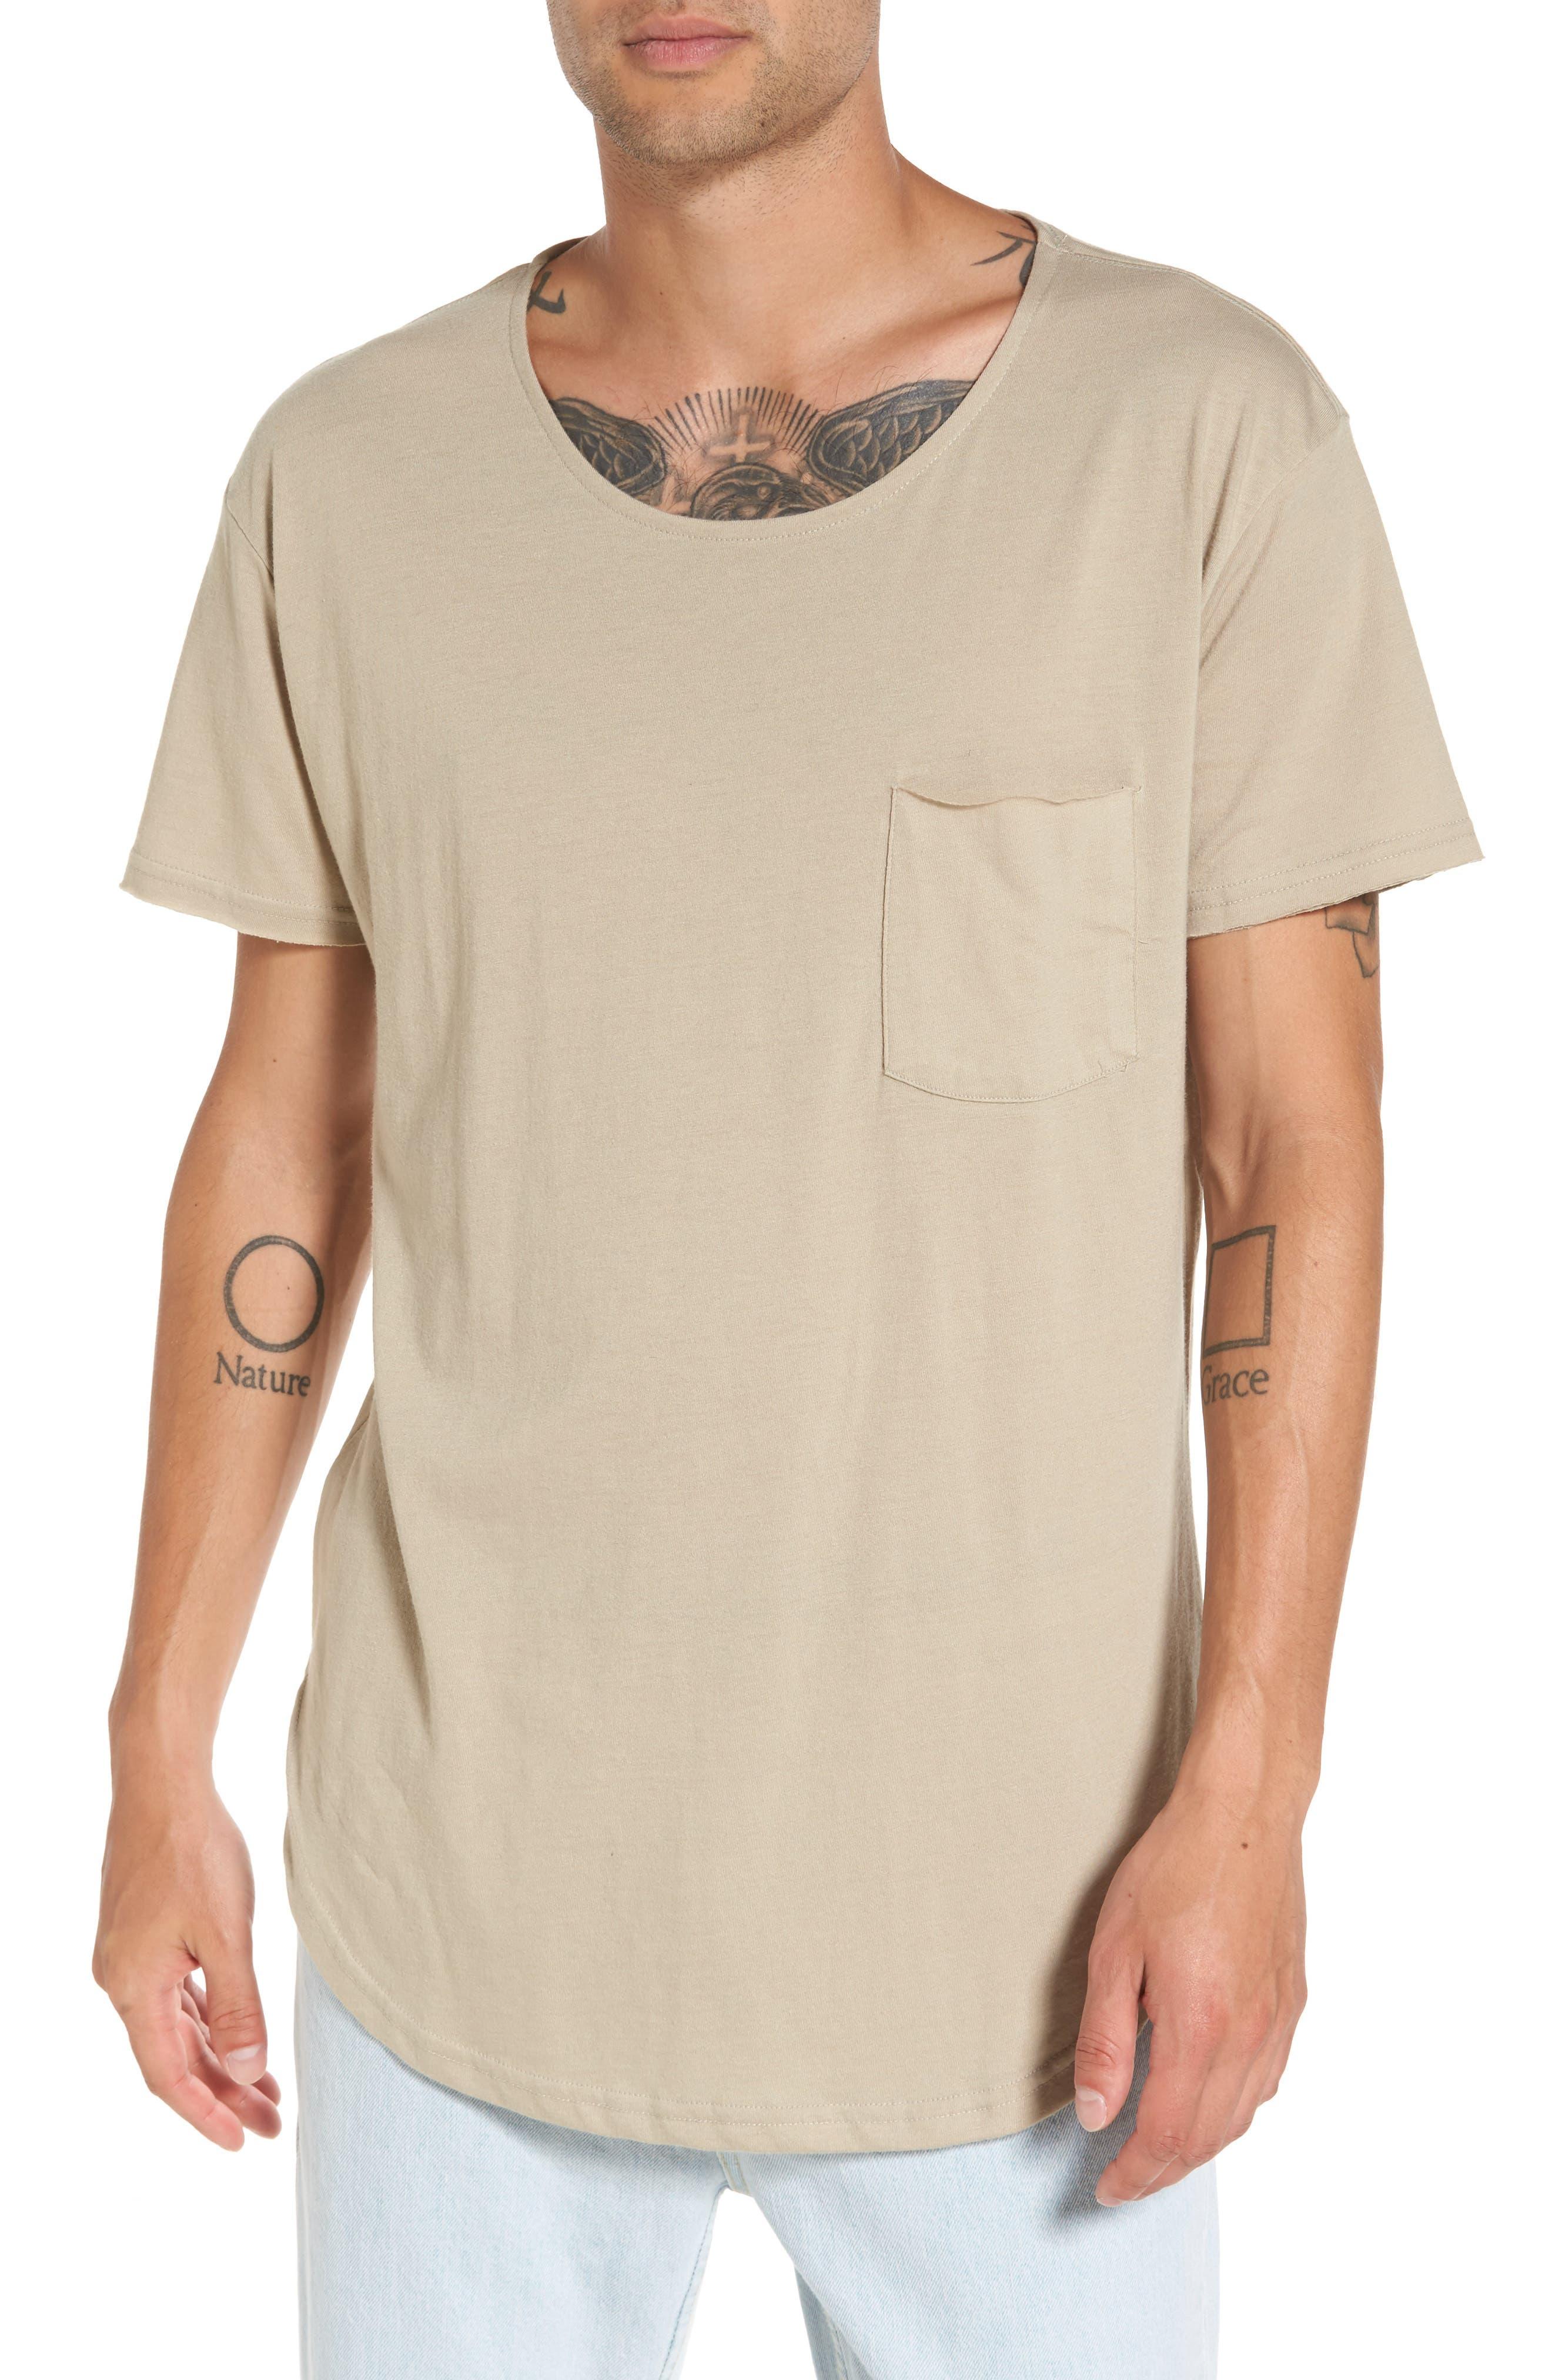 THE RAIL Longline Scallop T-Shirt